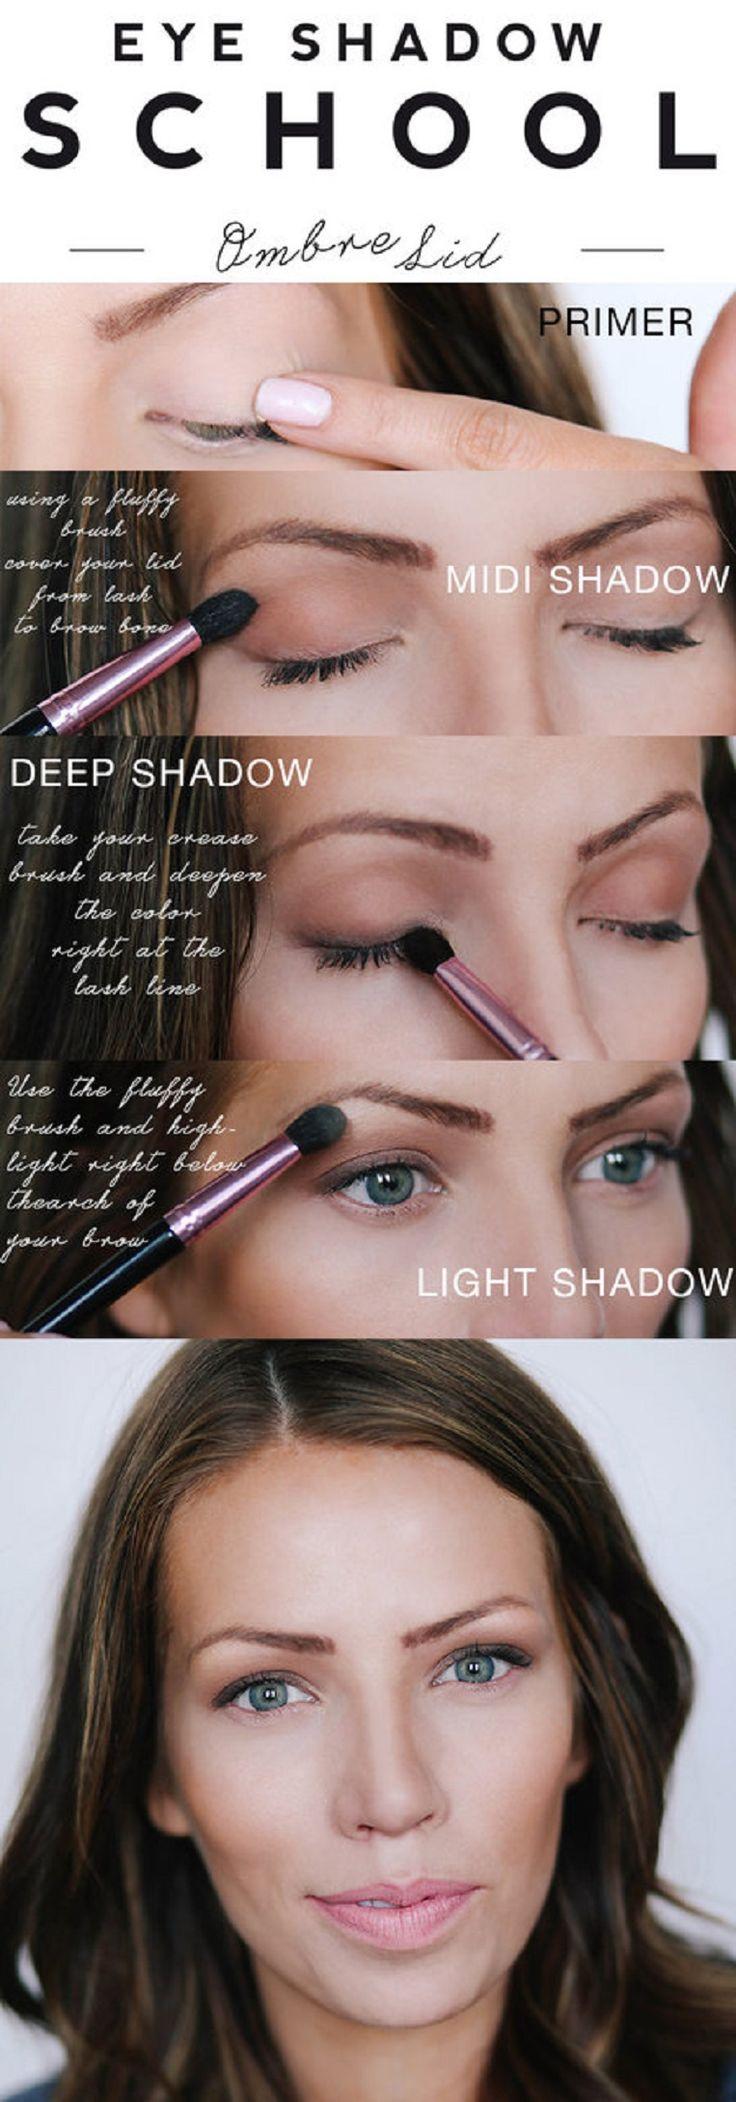 This ombre lid Eye Makeup Tutorial - 12 Easy No Makeup, Makeup Look Tutorials | GleamItUp